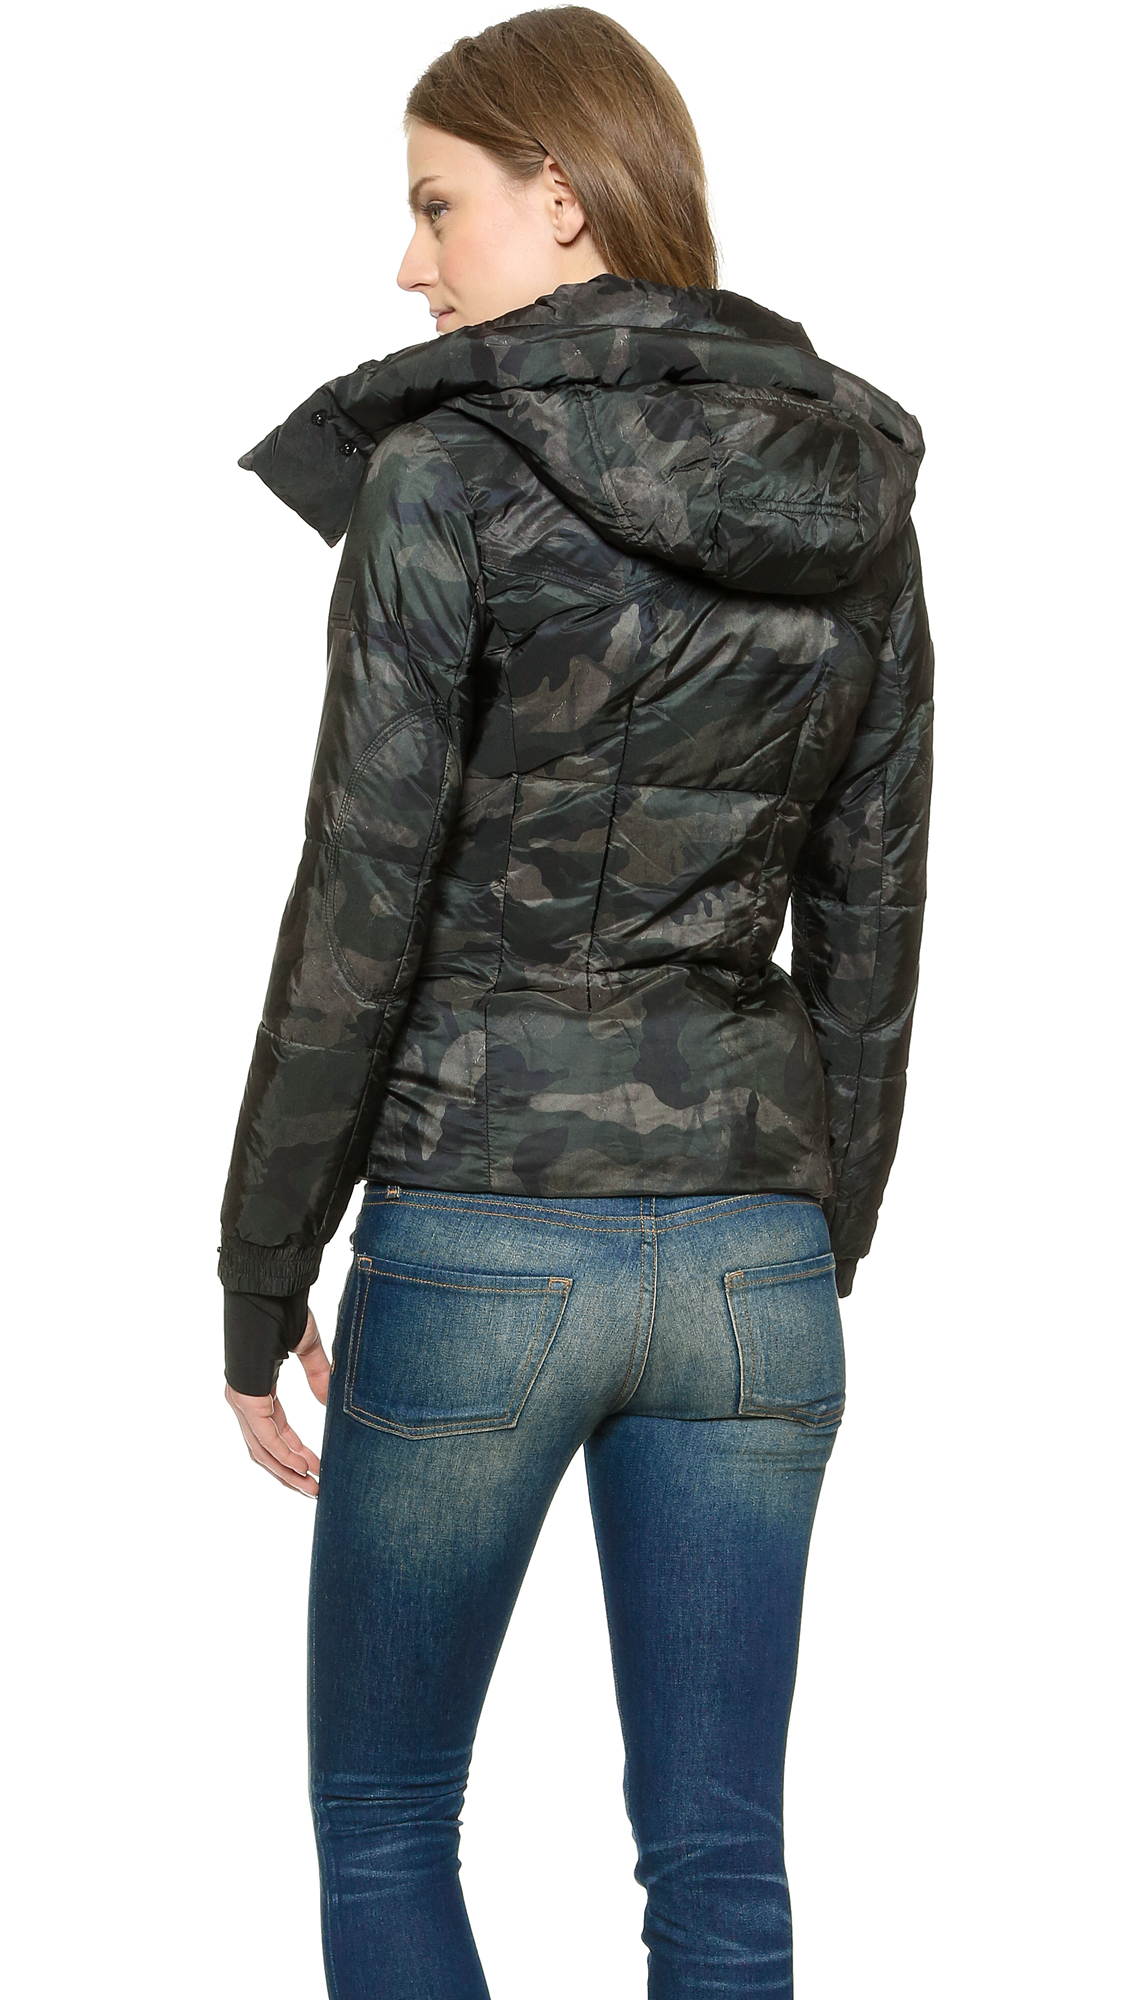 Sam. Jetset Jacket - Dark Camo in Green | Lyst Giorgio Armani Jacket